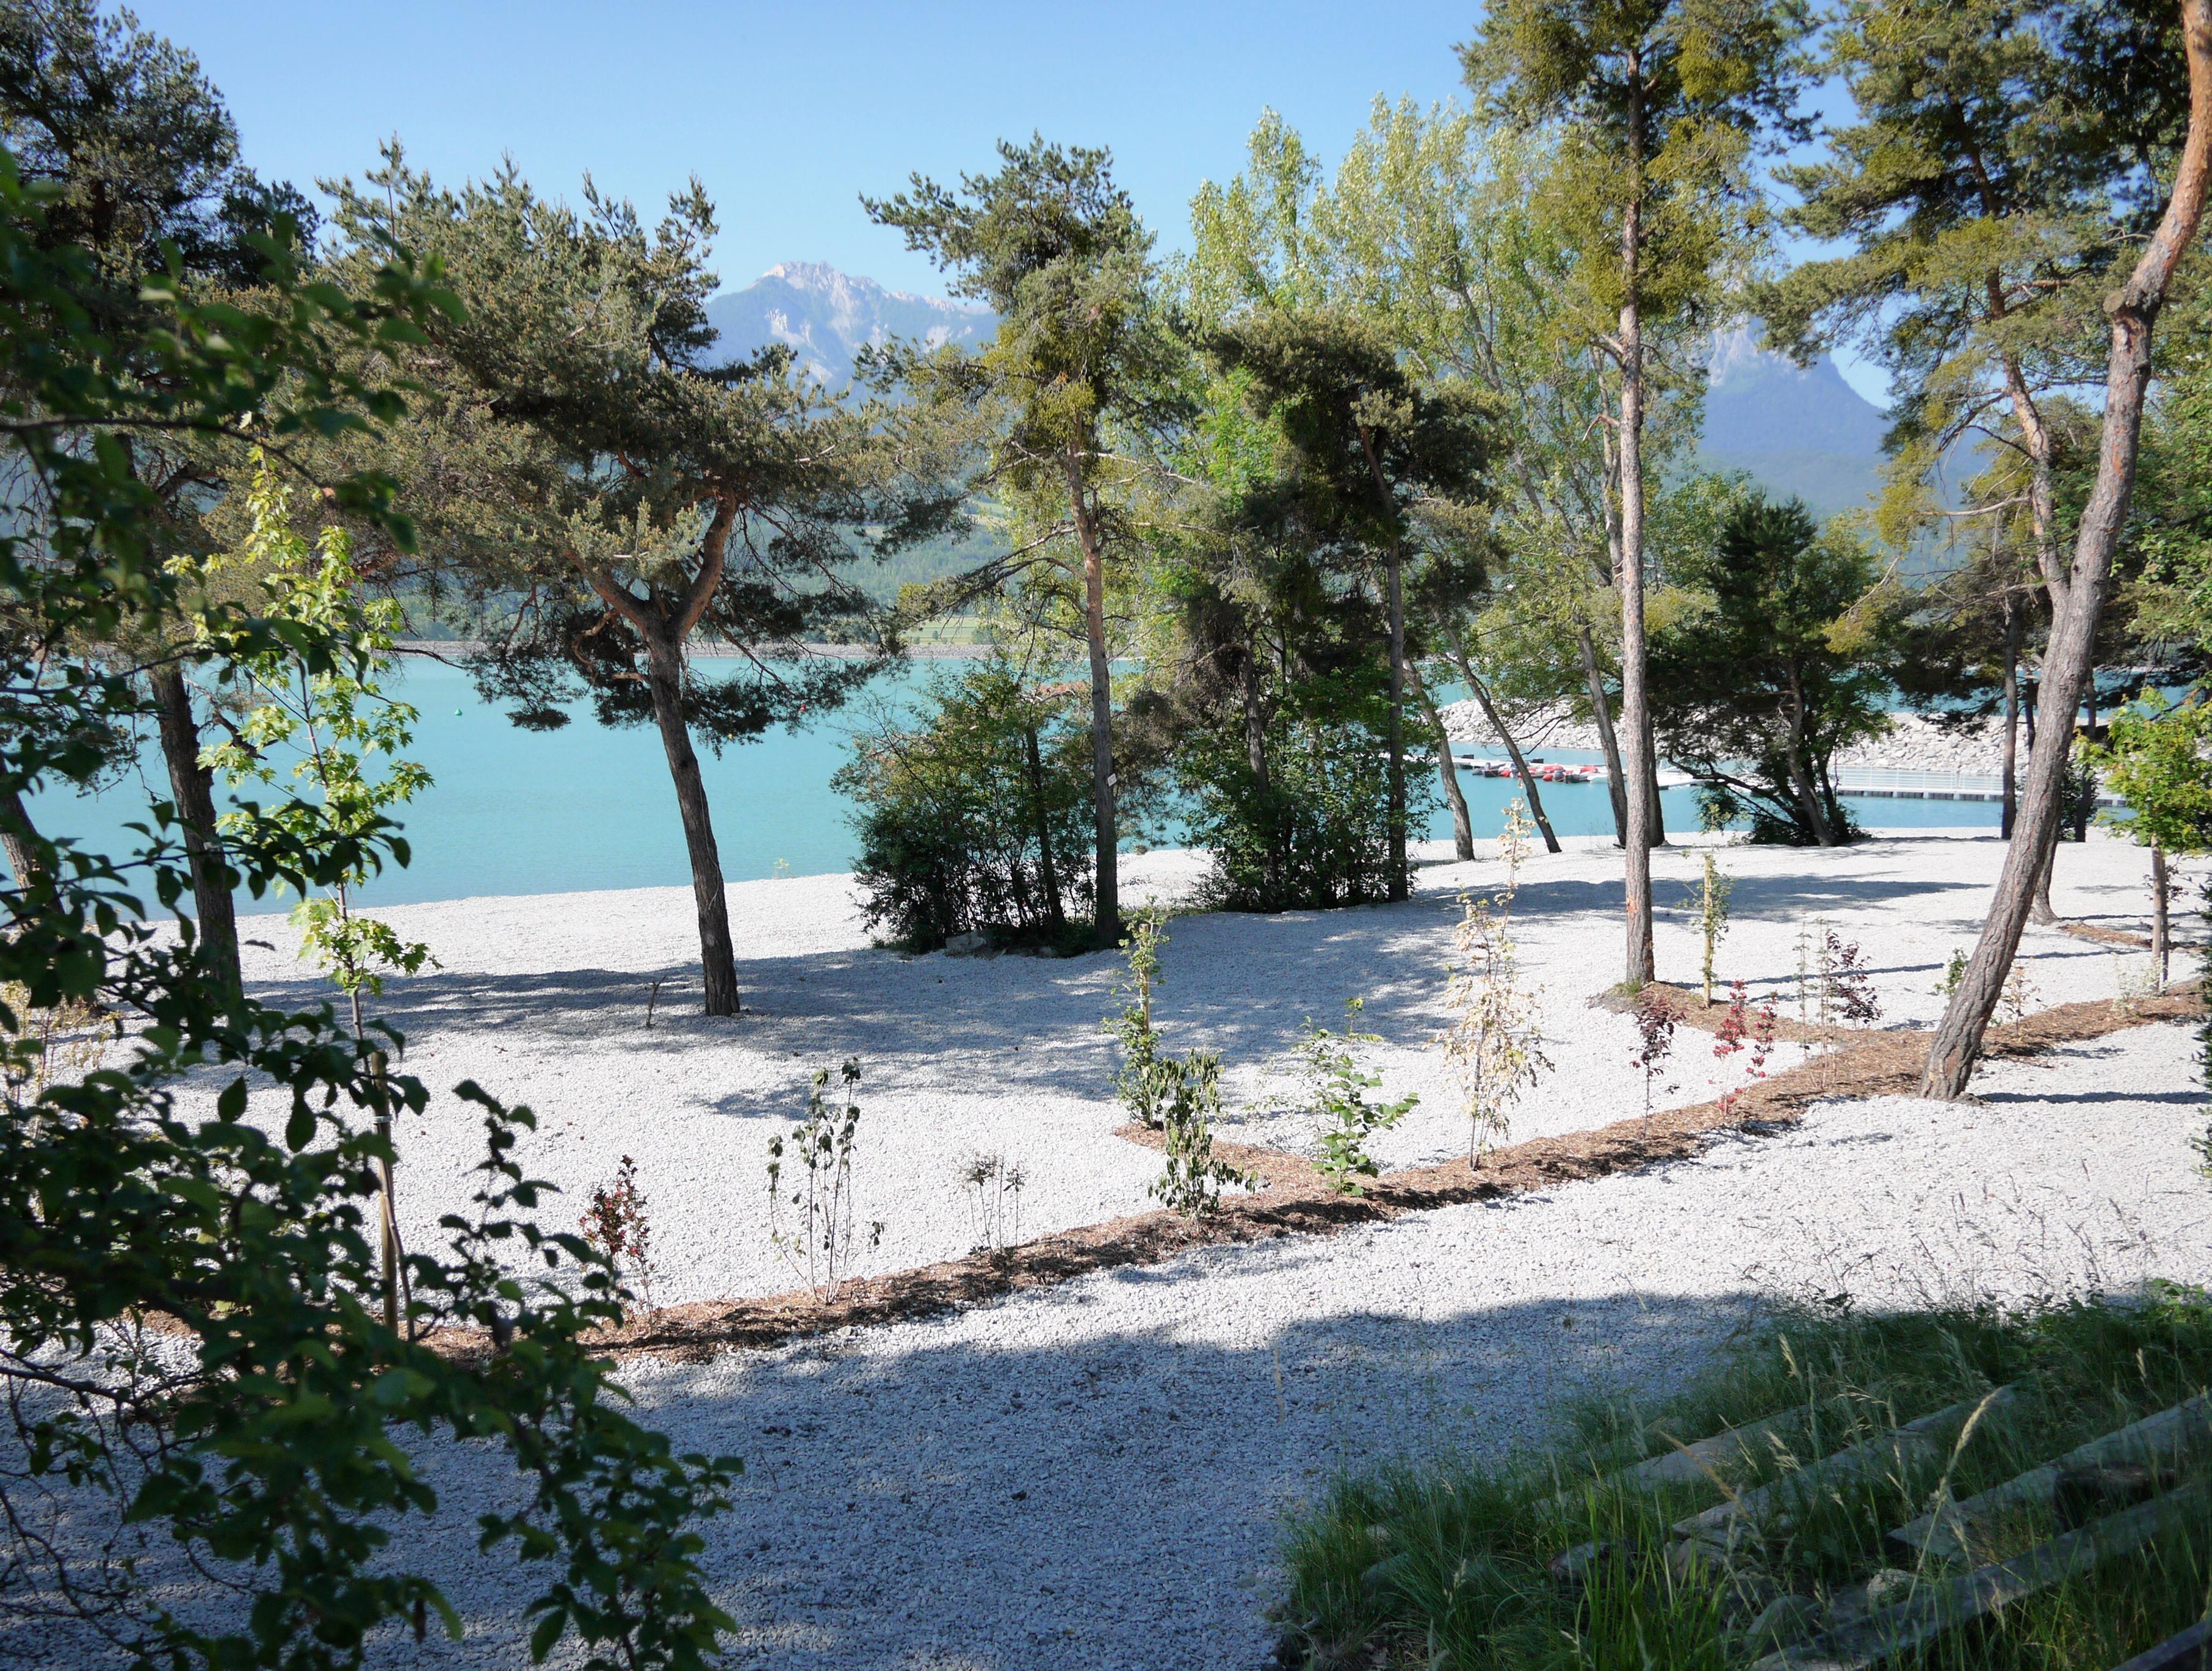 H bergements cna embrun - Camping lac serre poncon piscine ...